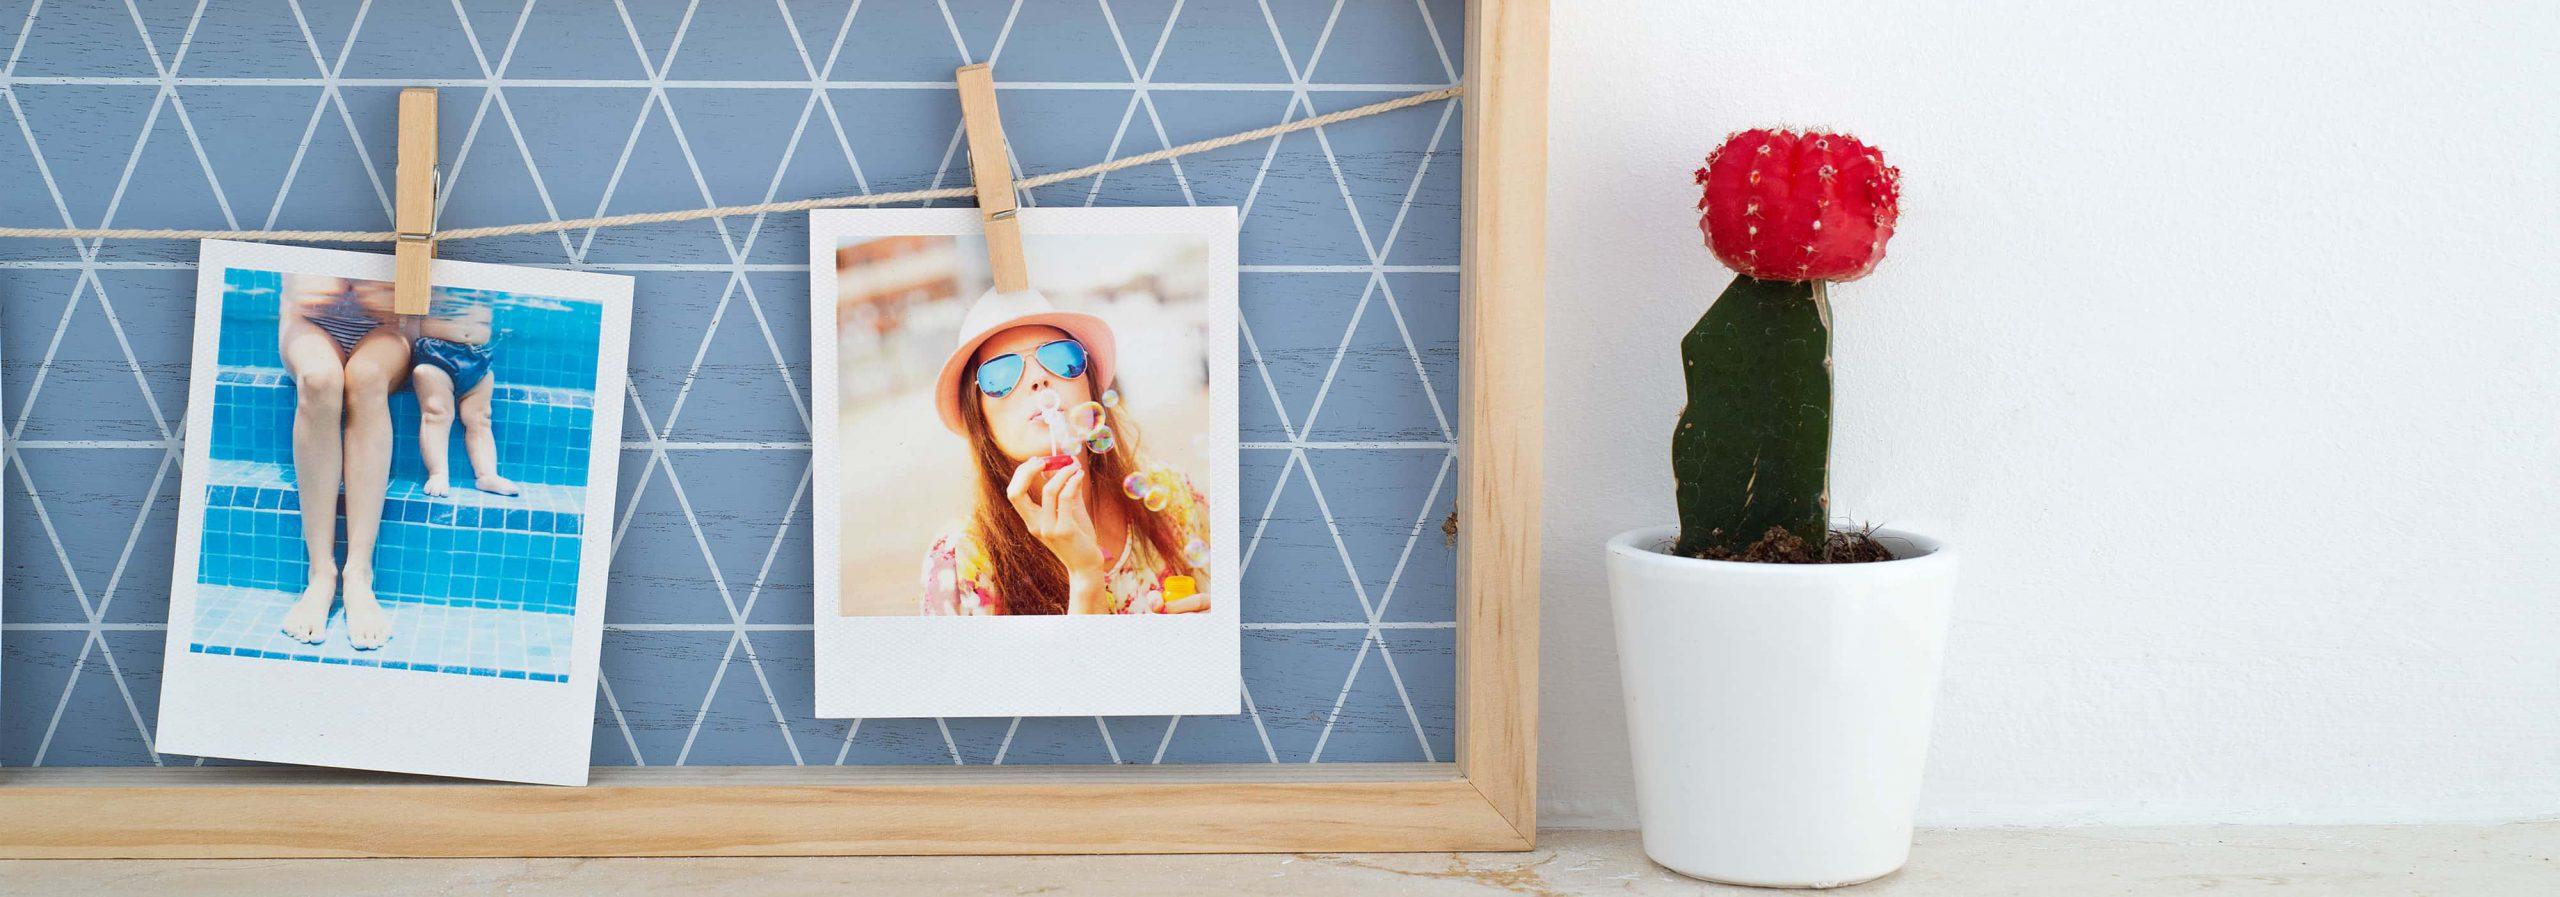 fotos con pinzas colgadas